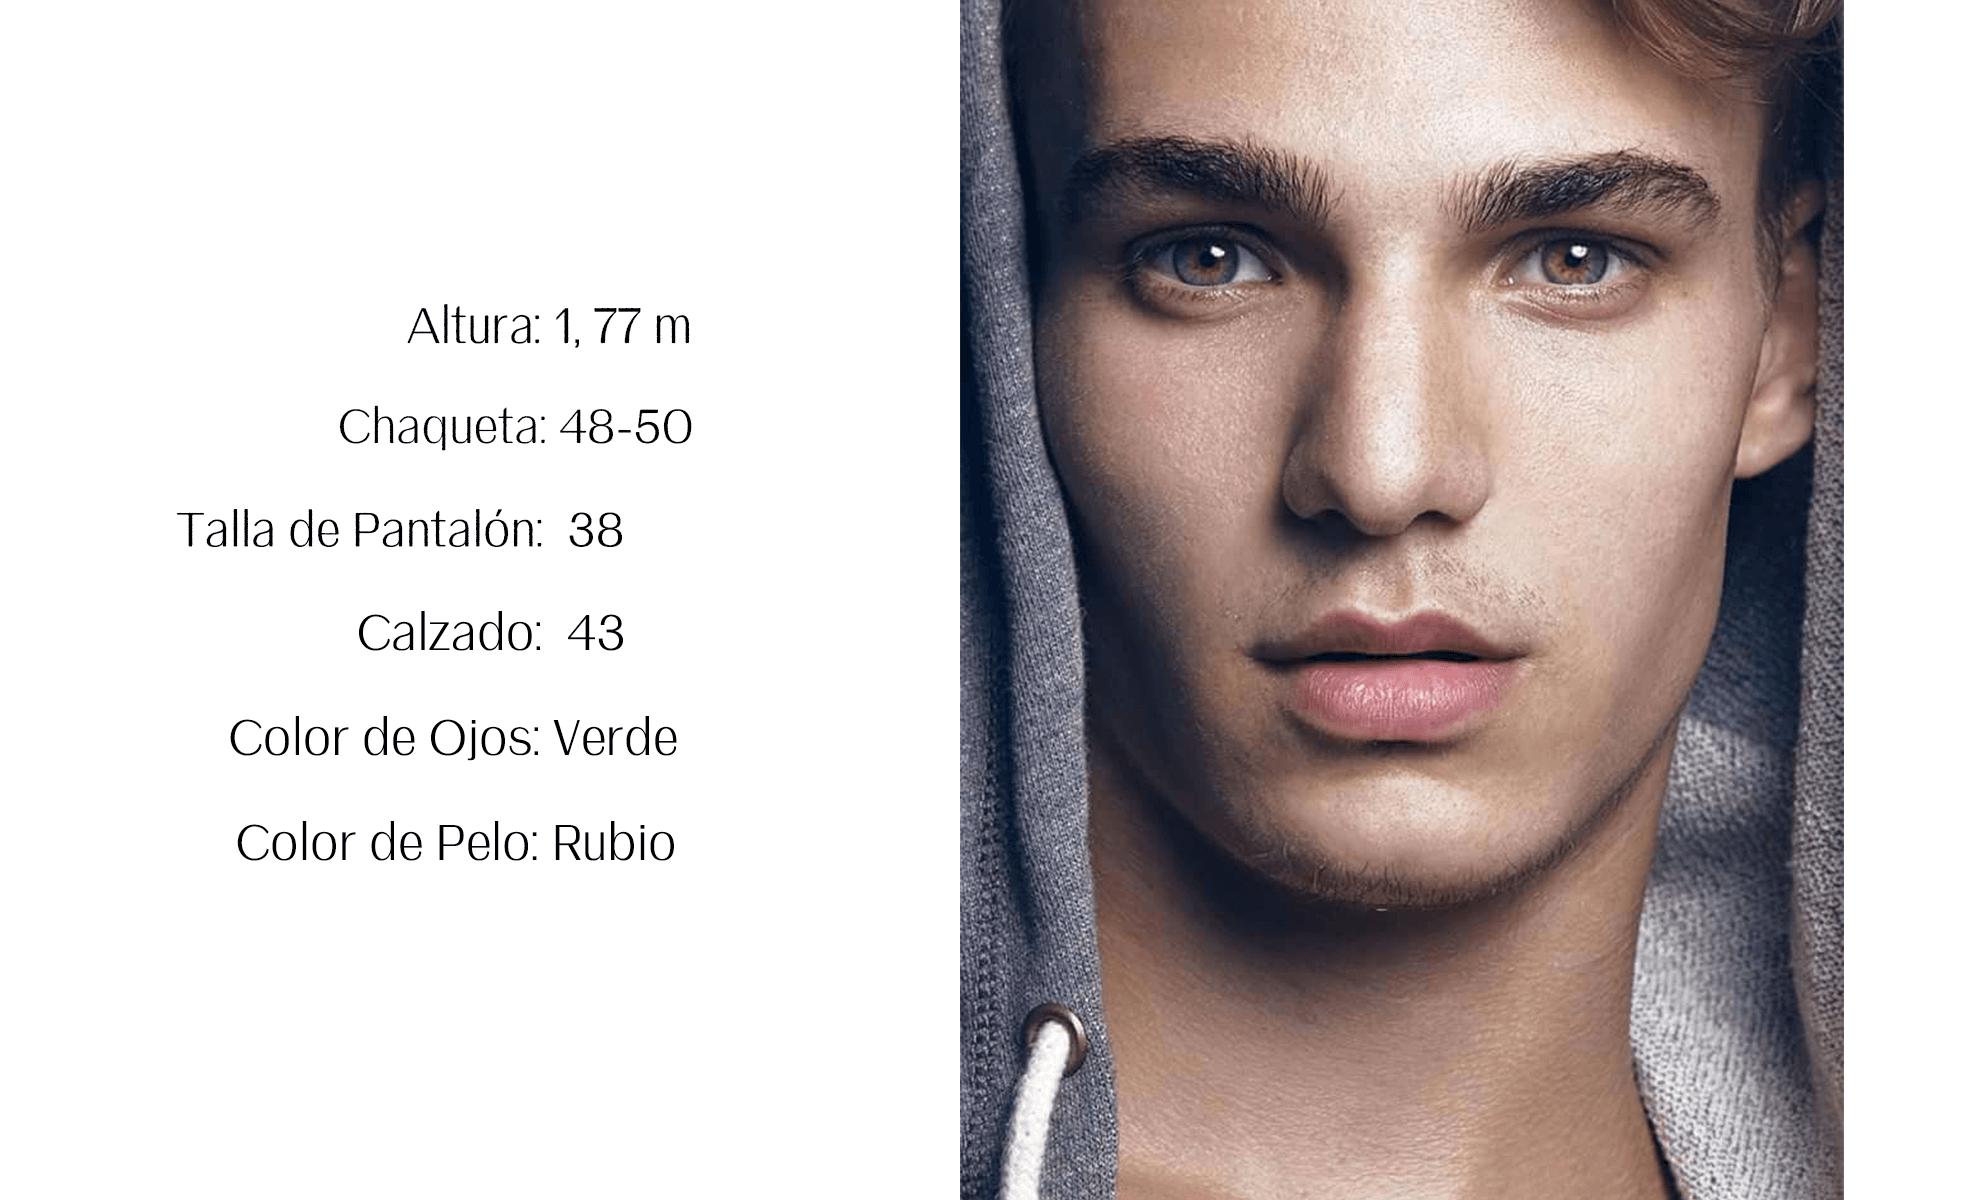 Andrey01